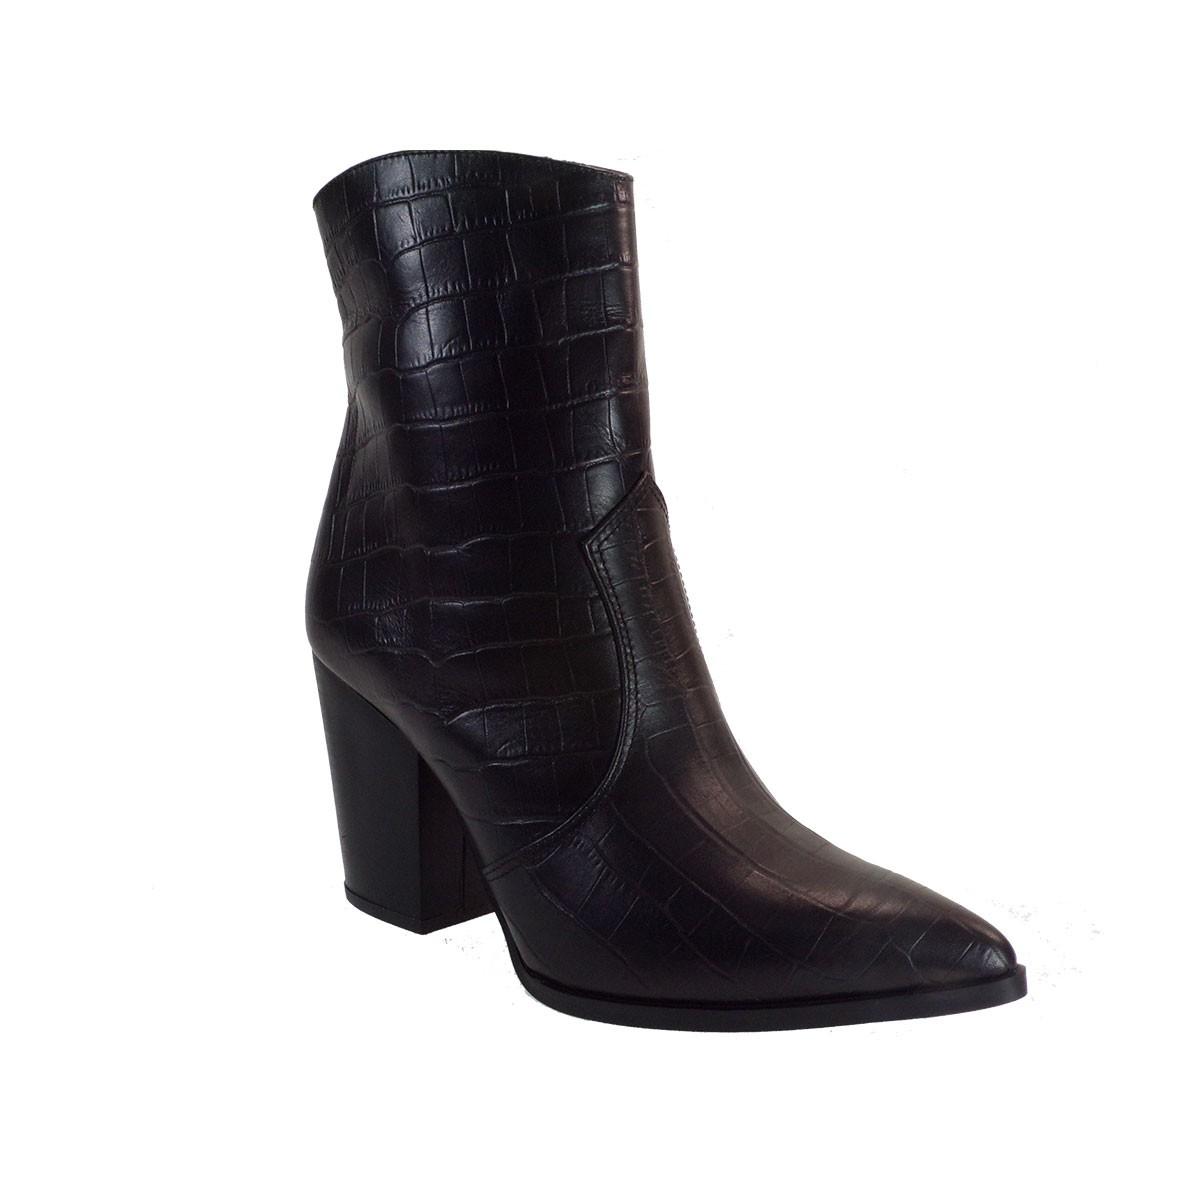 Fardoulis Shoes Γυναικεία Μποτάκια COW BOY Κ-316 Μαύρο Δέρμα Κορκό